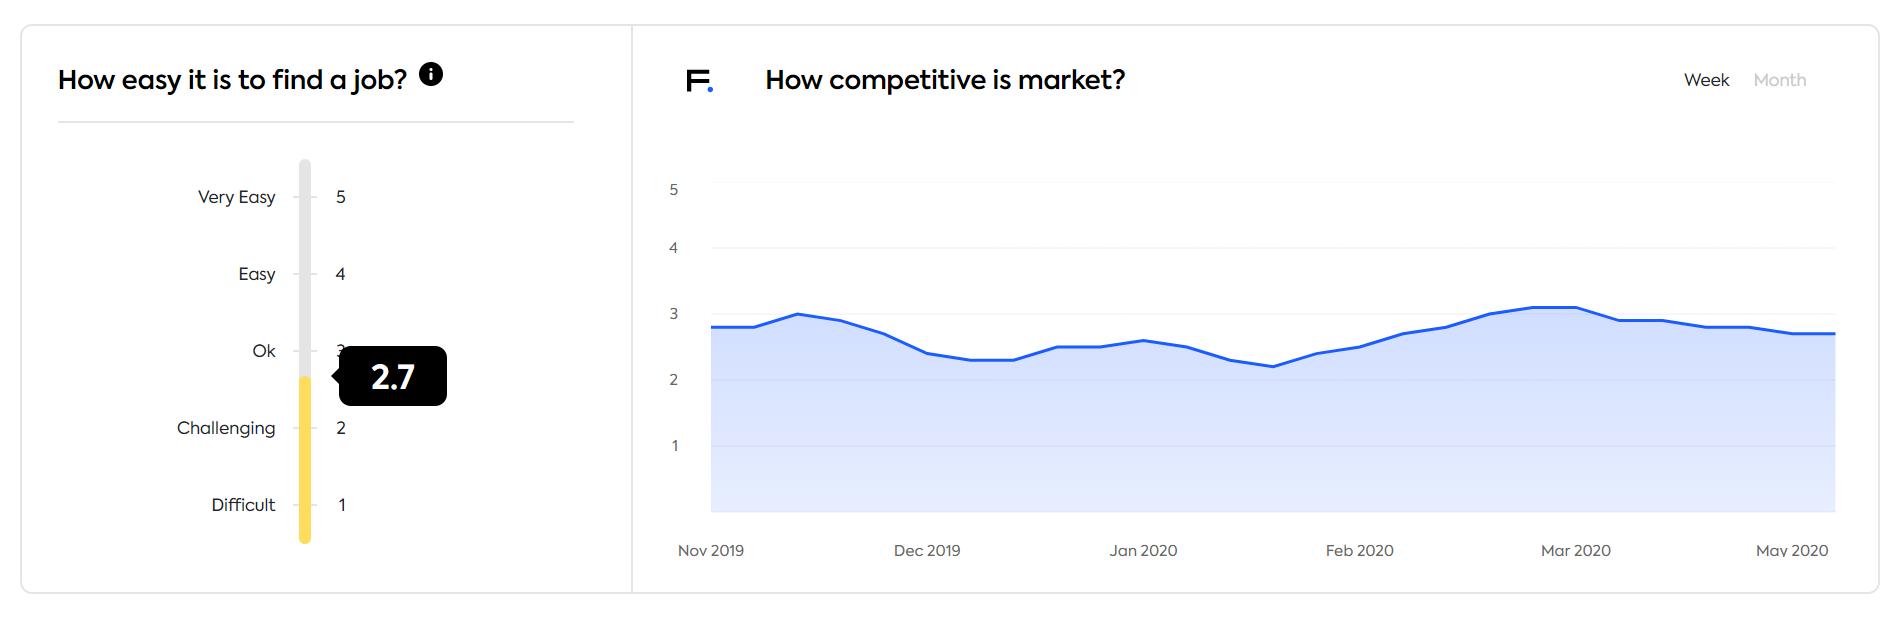 Estonian market competitiveness